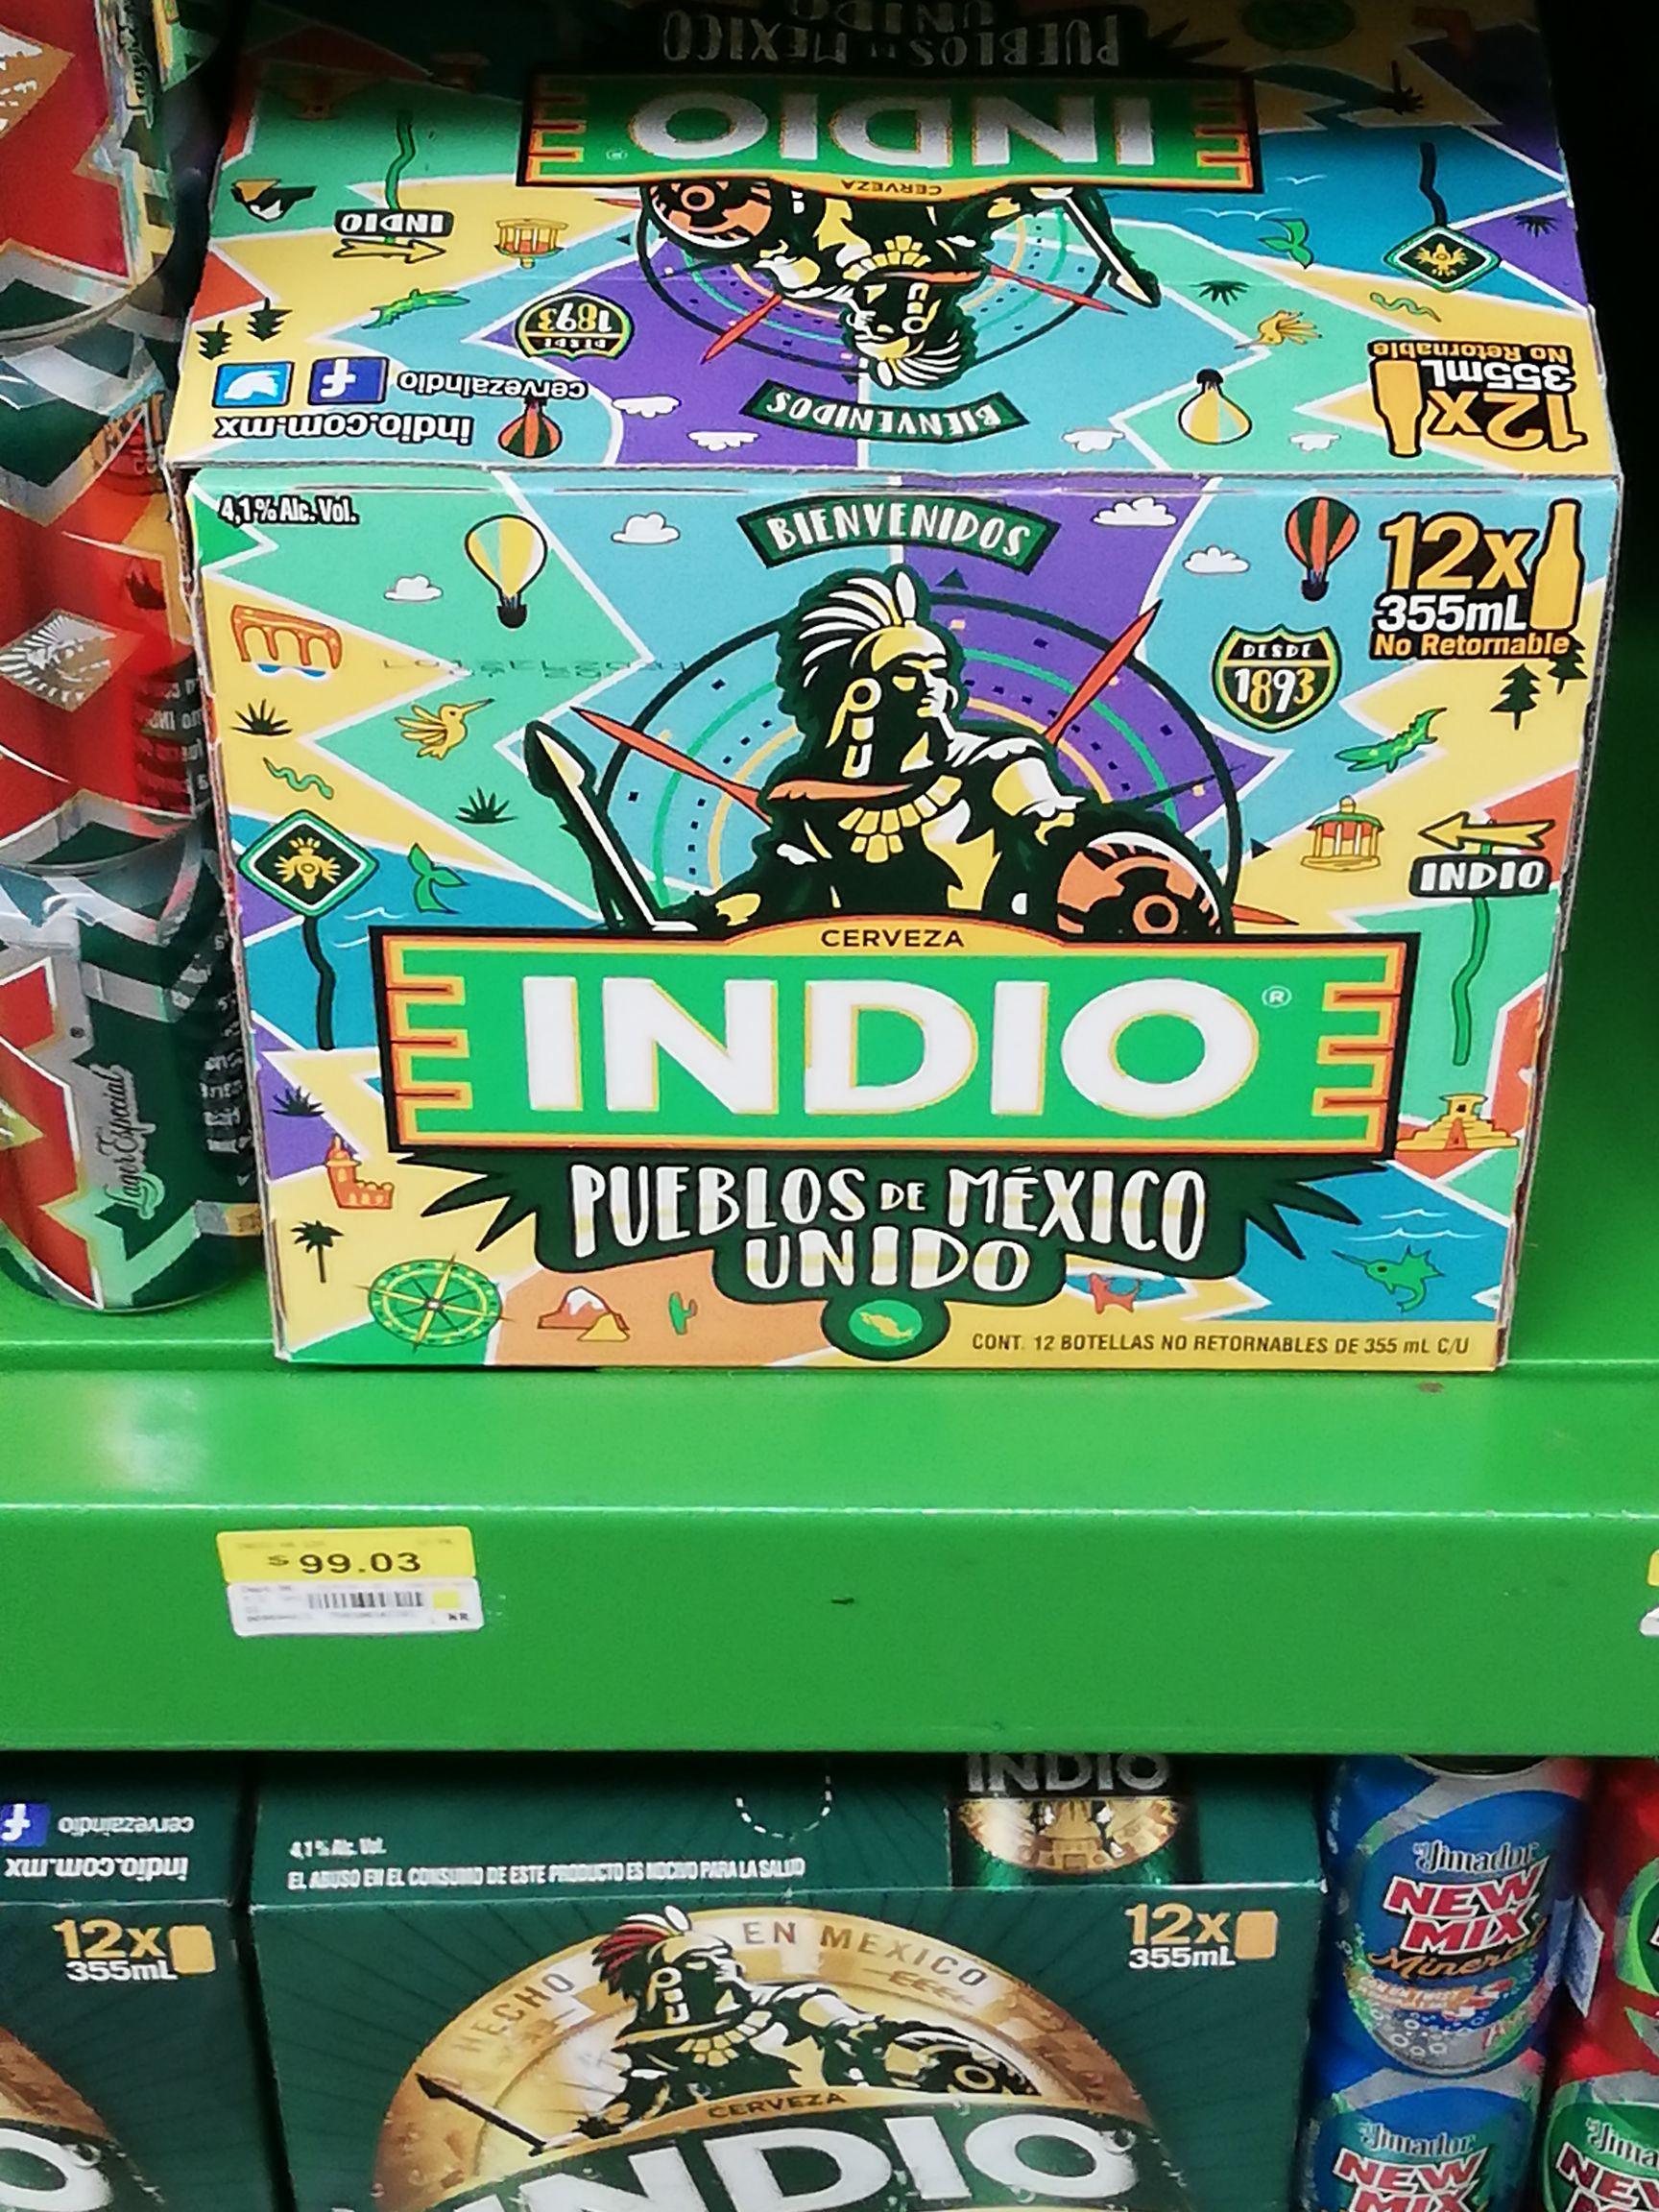 Bodega Aurrerá: 12pack cerveza indio